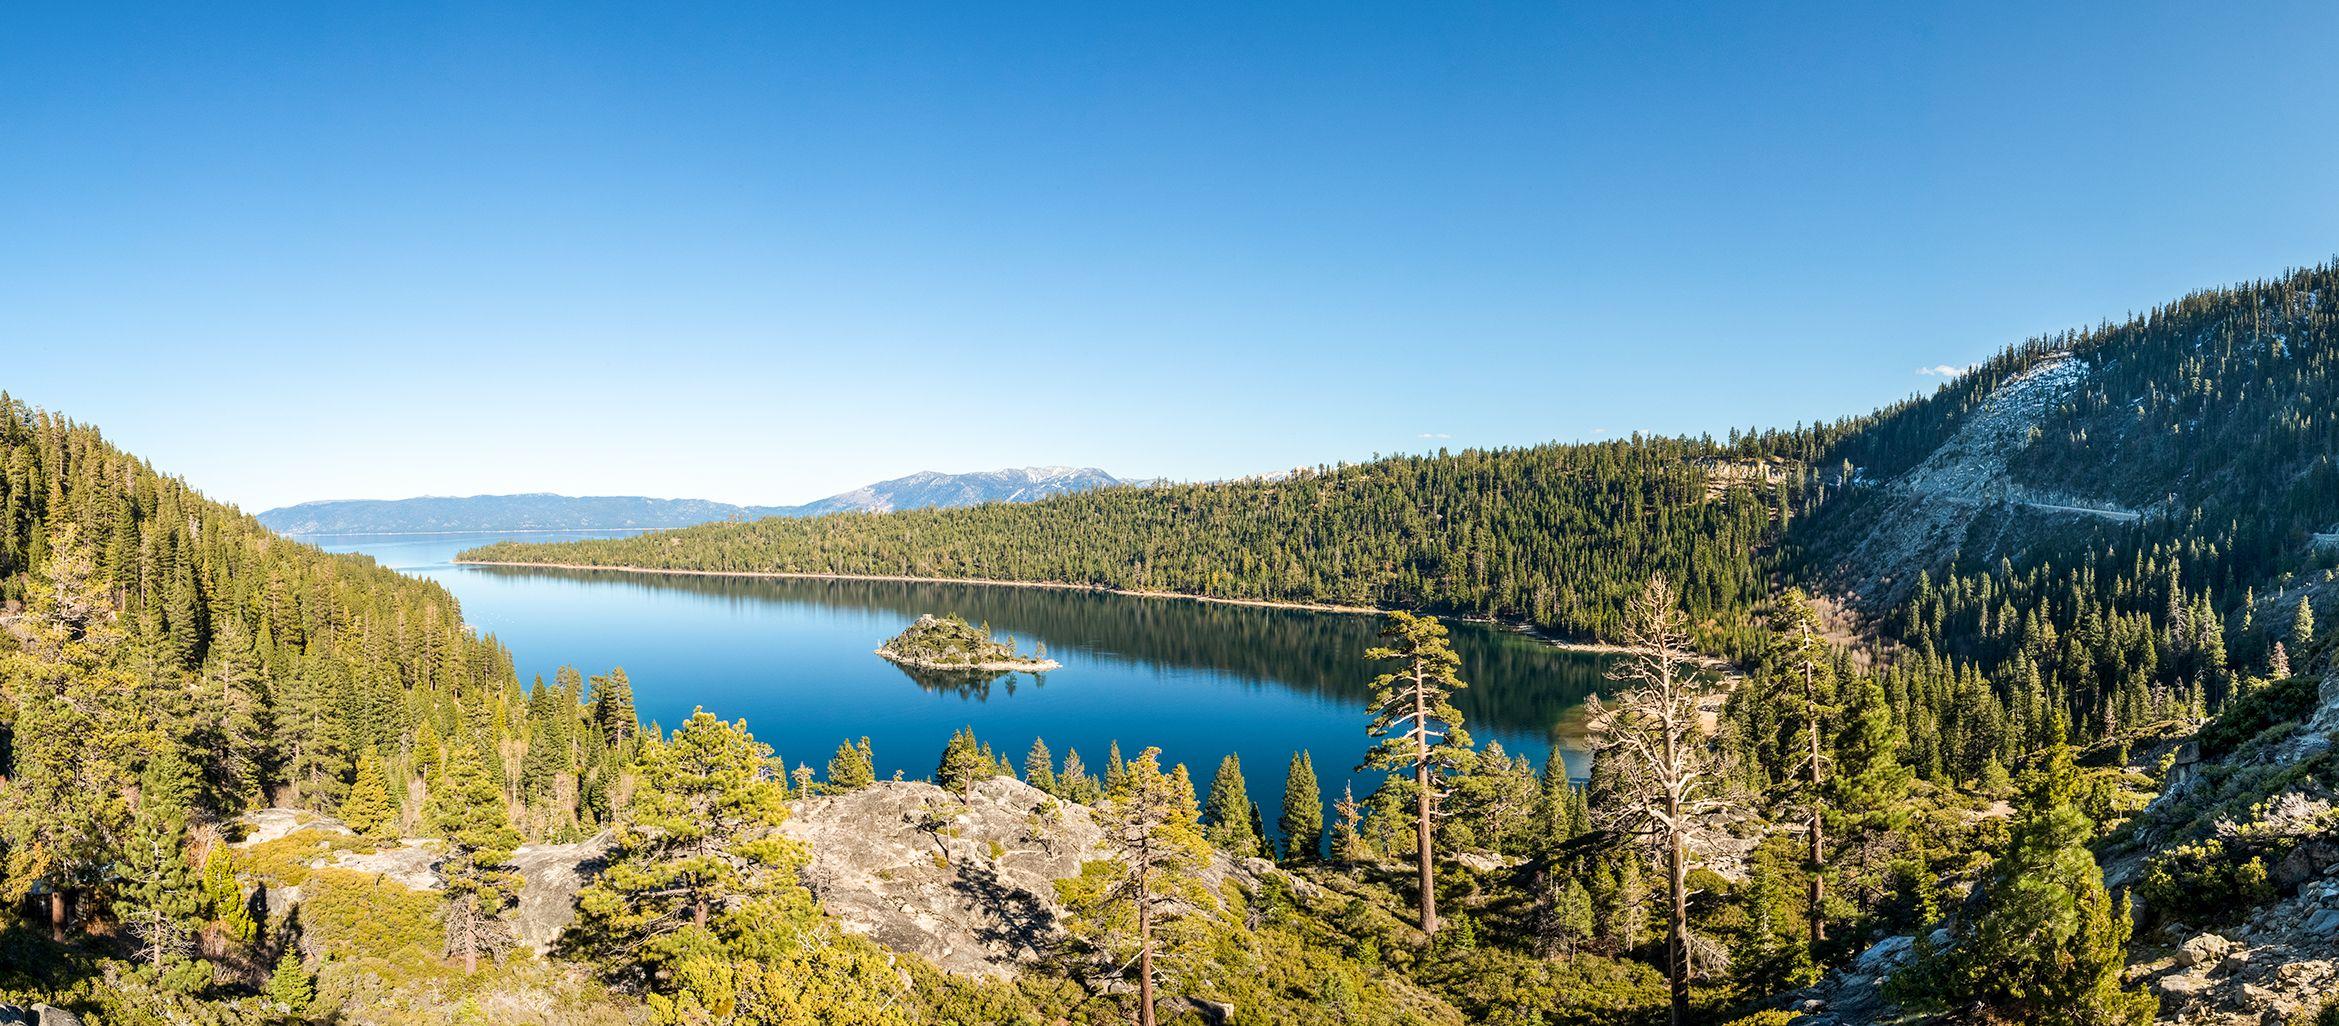 Landschaftsaufnahme vom Lake Tahoe